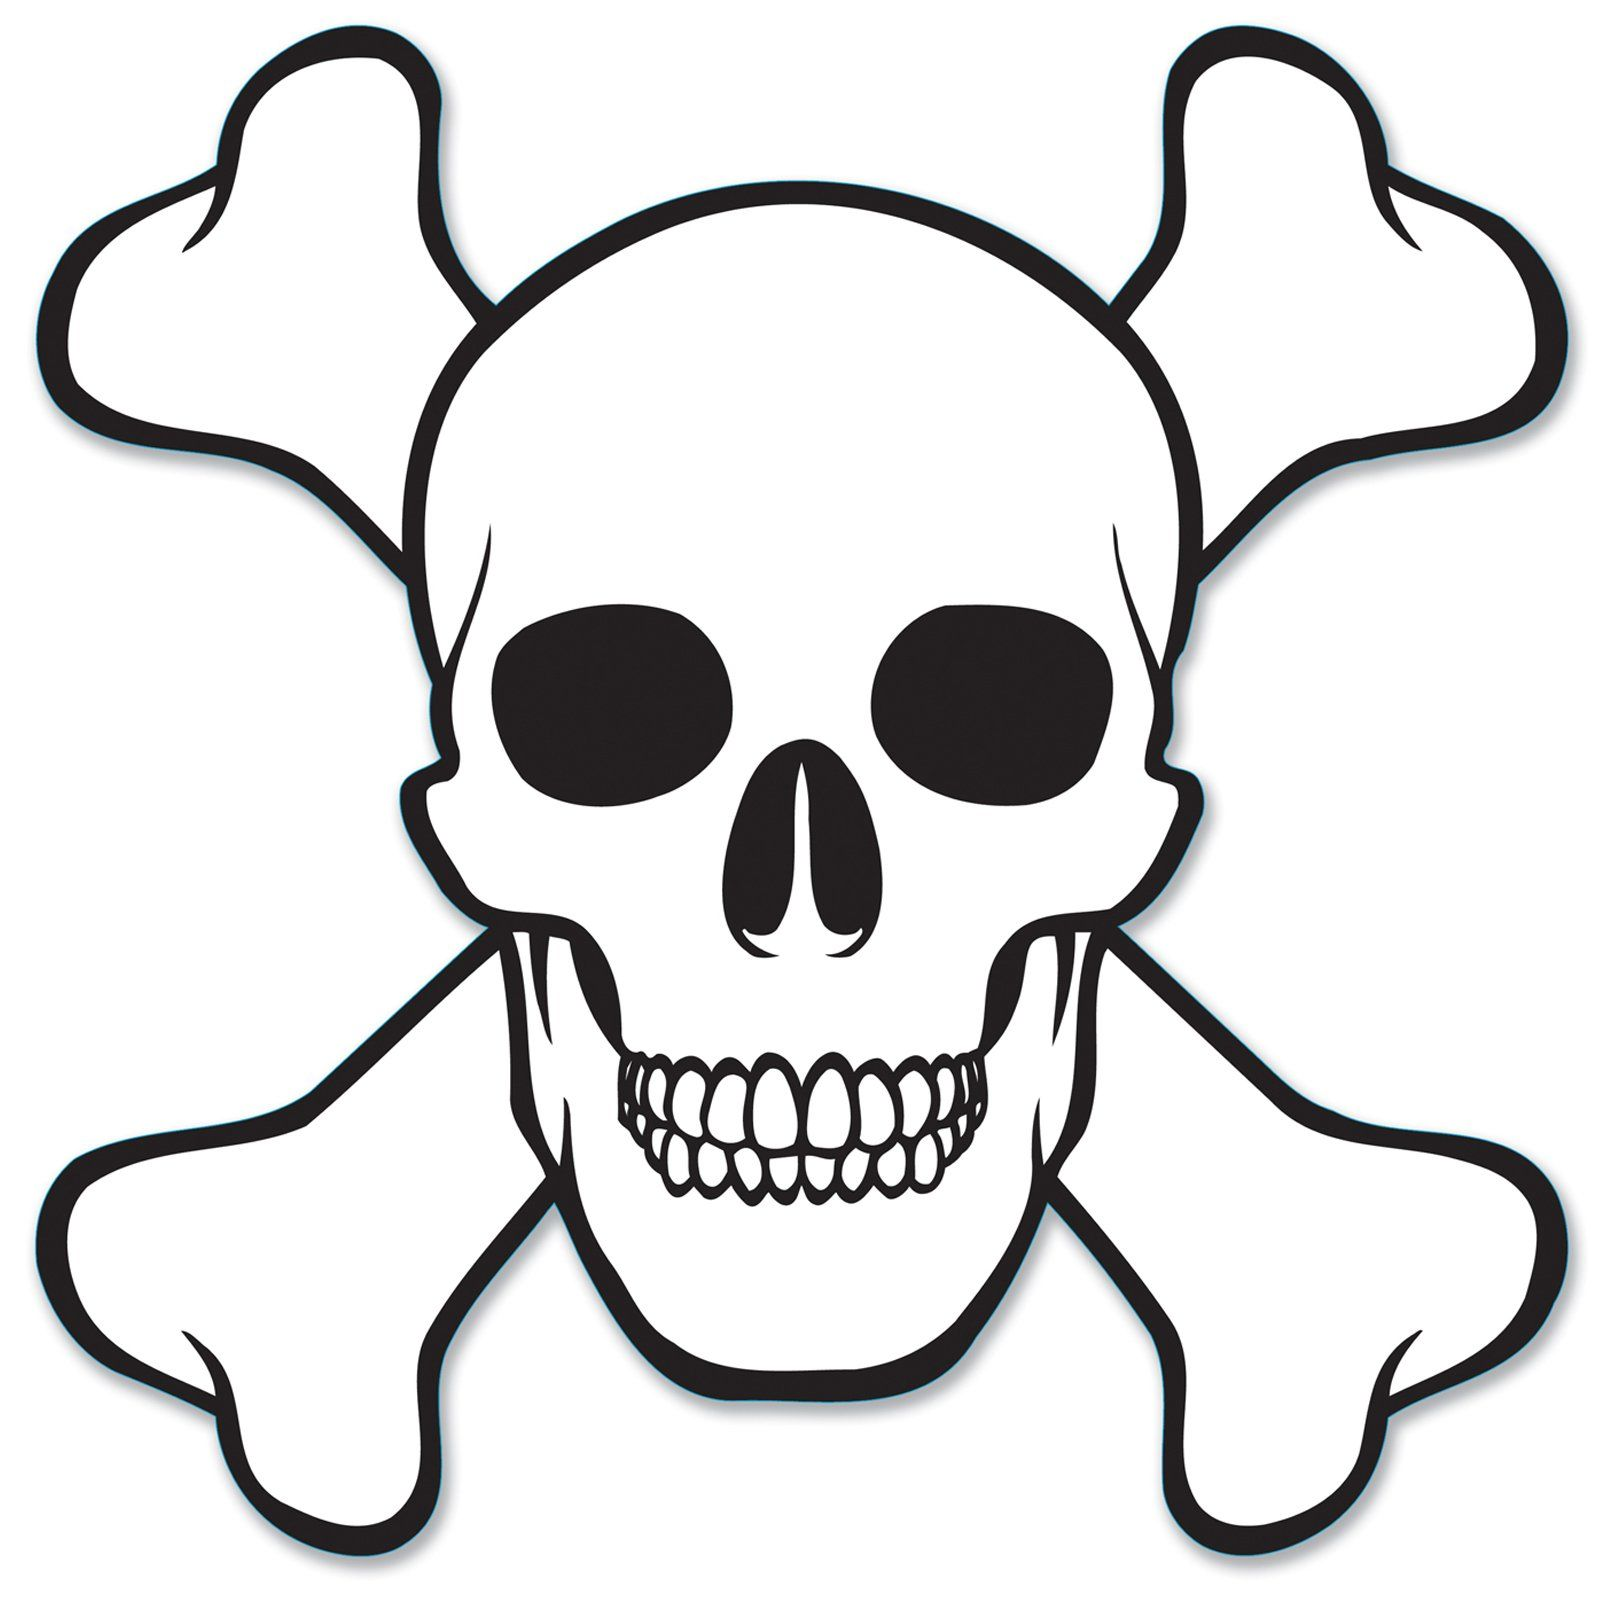 Skull And Crossbones Cutout Skull Coloring Pages Skull Stencil Skull And Crossbones